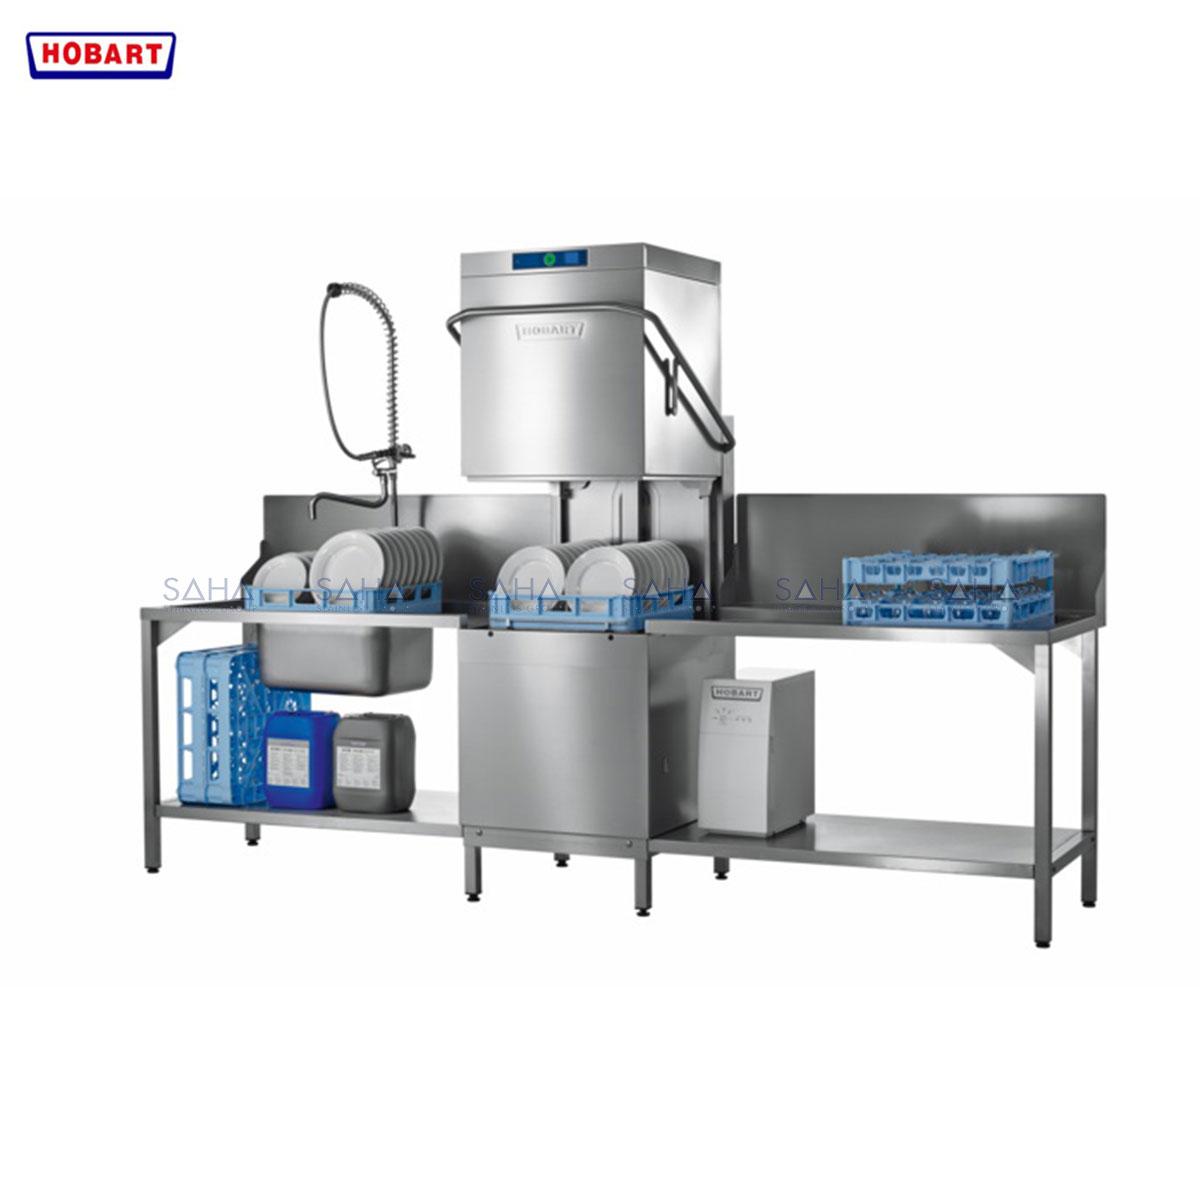 Hobart - Dishwasher - PROFI AM900